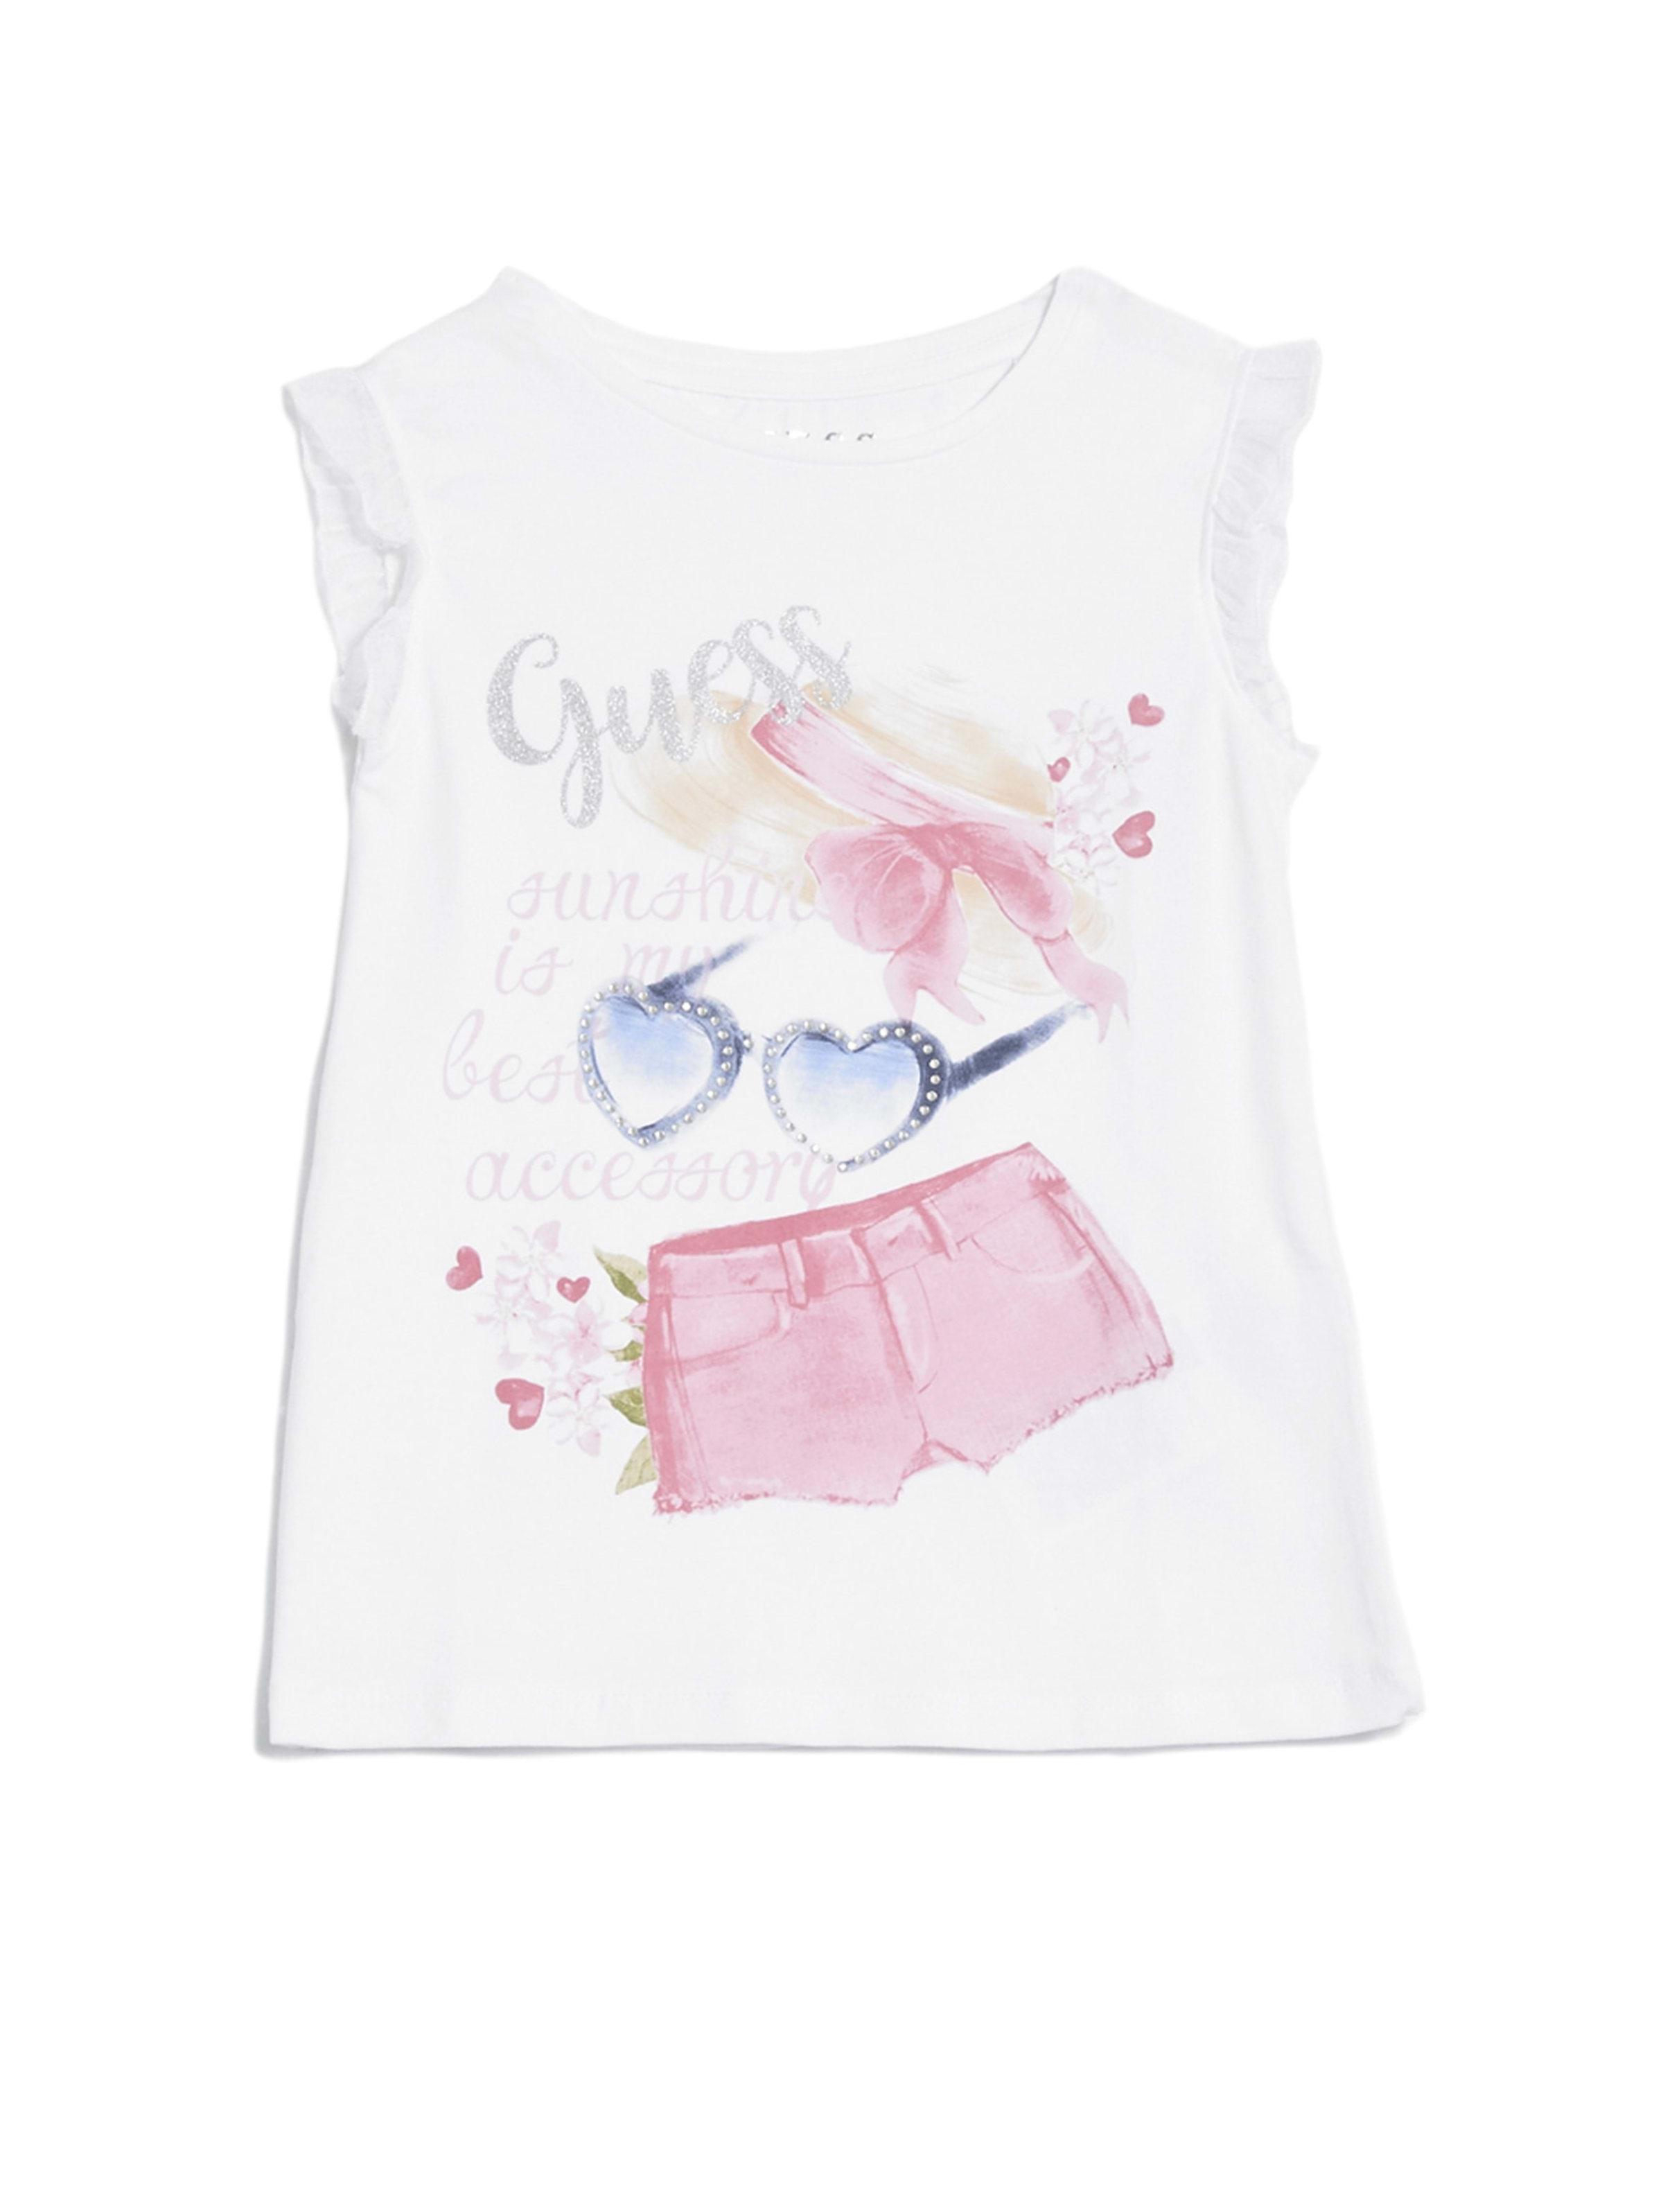 GUESS Girls Short Sleeve Mesh Trim Sequin Graphic T-Shirt